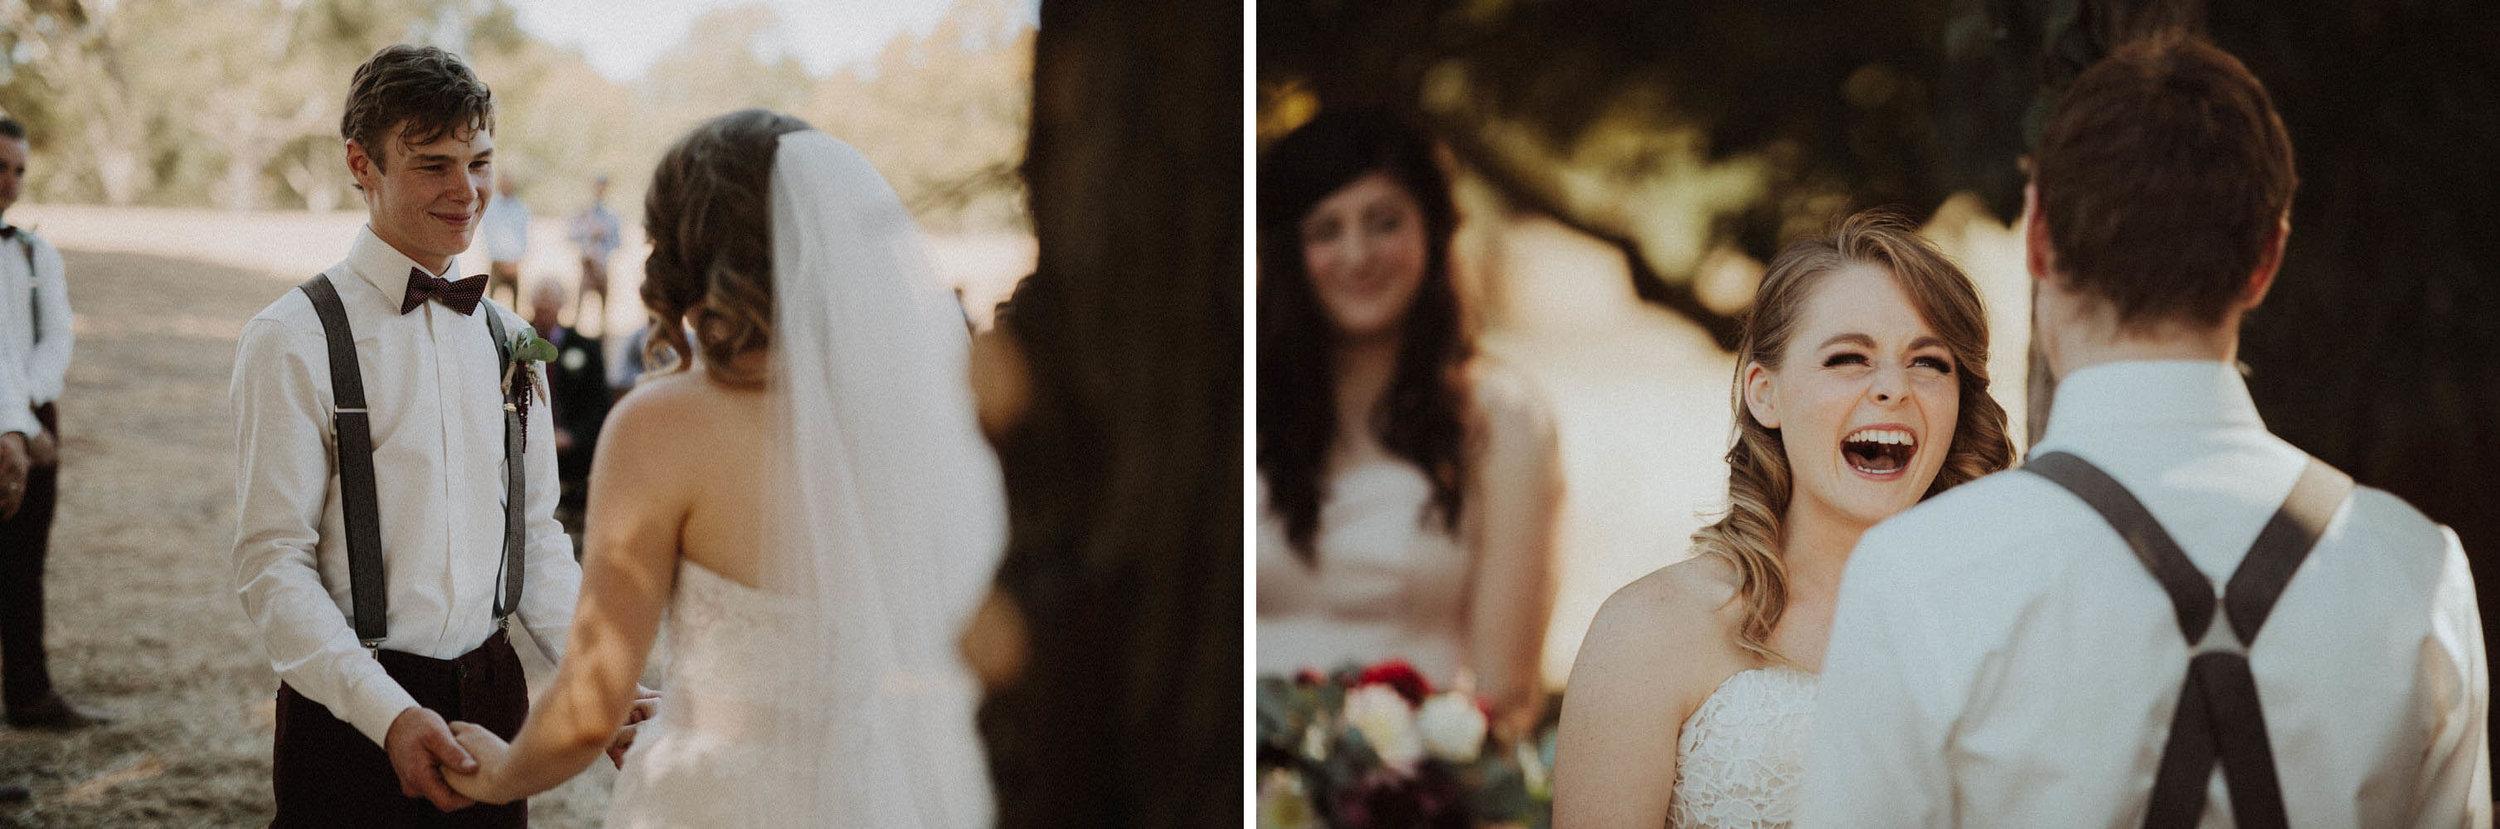 australian-wedding-photography_100(1532)2.jpg